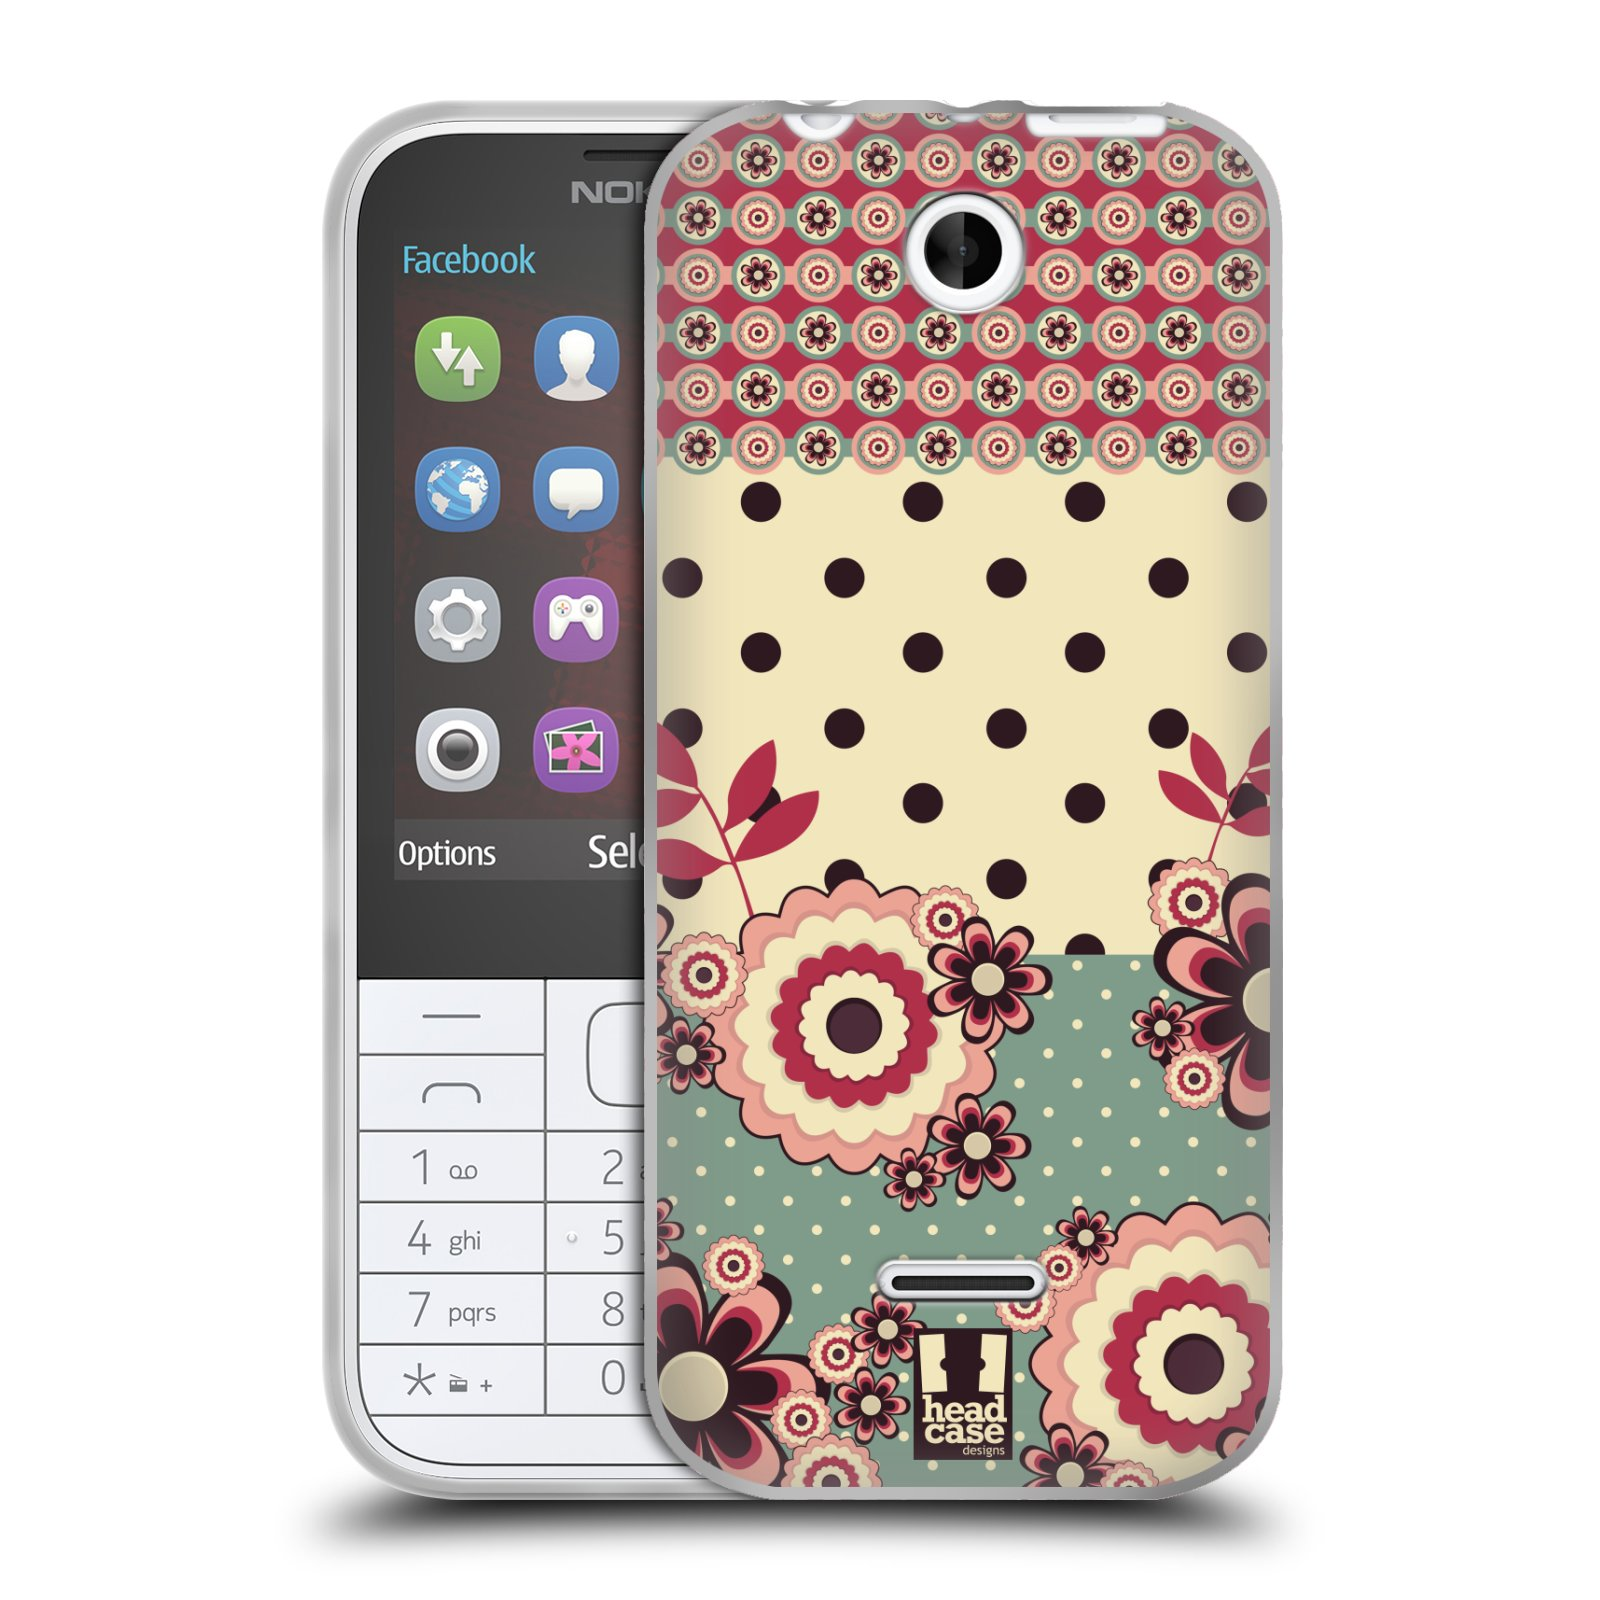 Silikonové pouzdro na mobil Nokia 225 HEAD CASE KVÍTKA PINK CREAM (Silikonový kryt či obal na mobilní telefon Nokia 225)